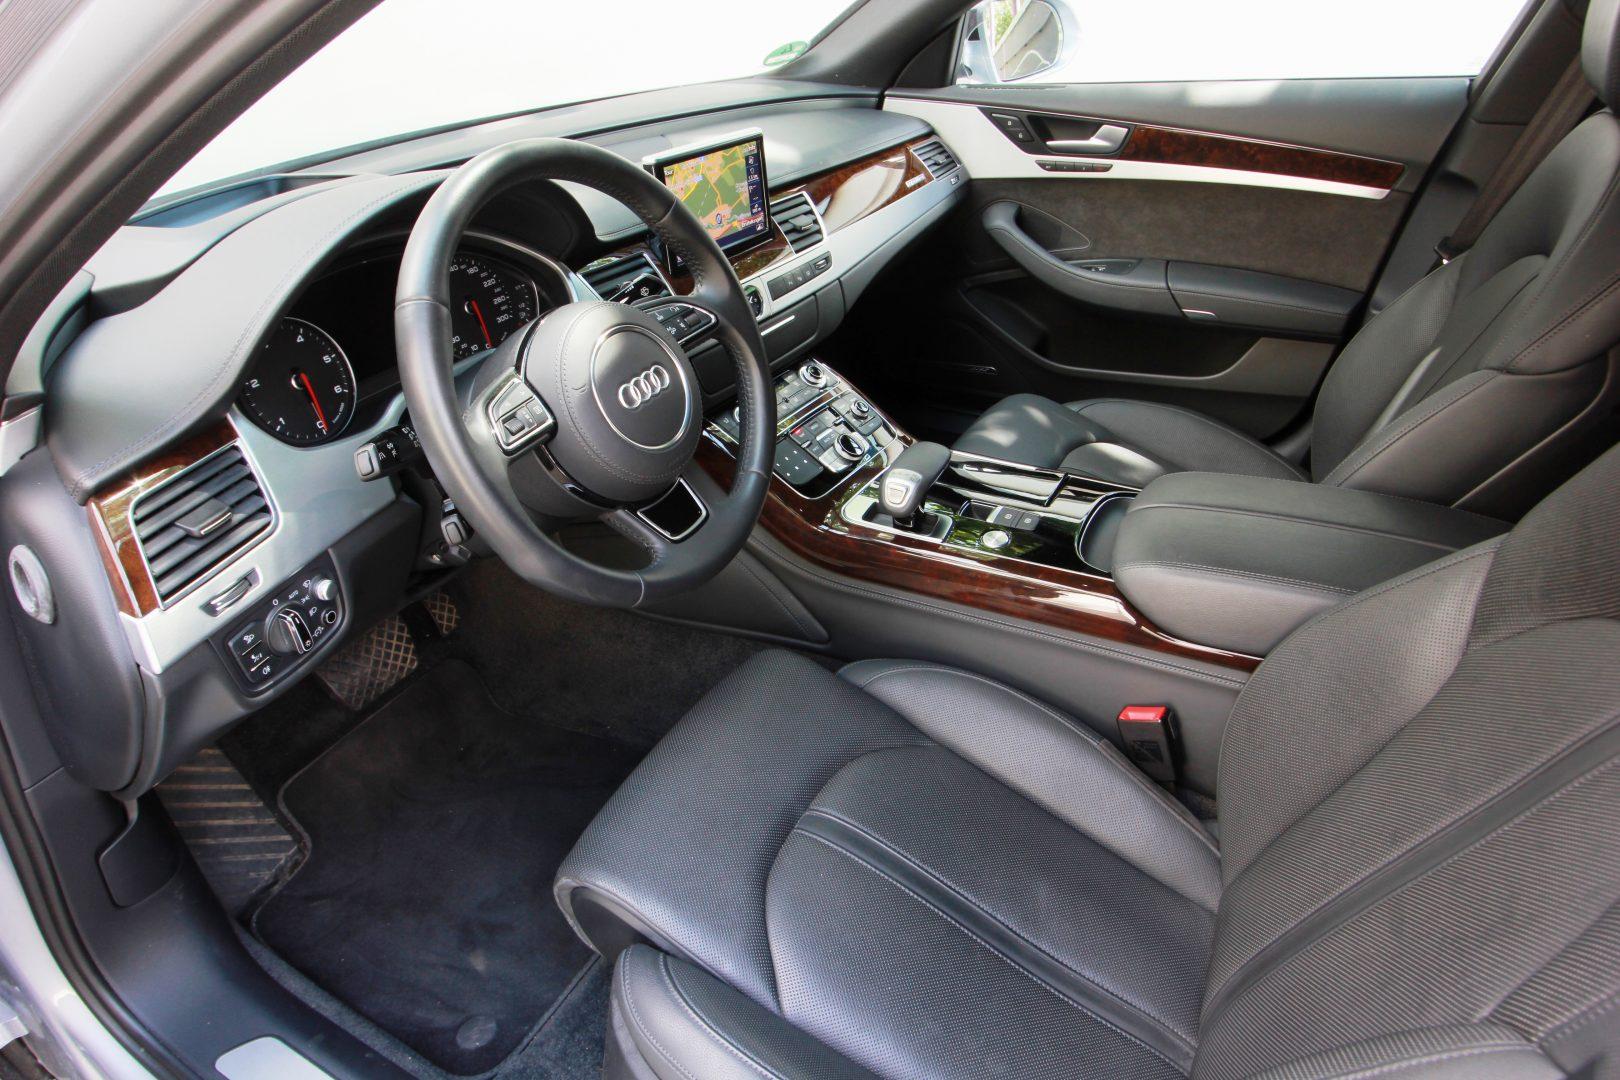 AIL Audi A8 3.0 TDI DAB Bose  2